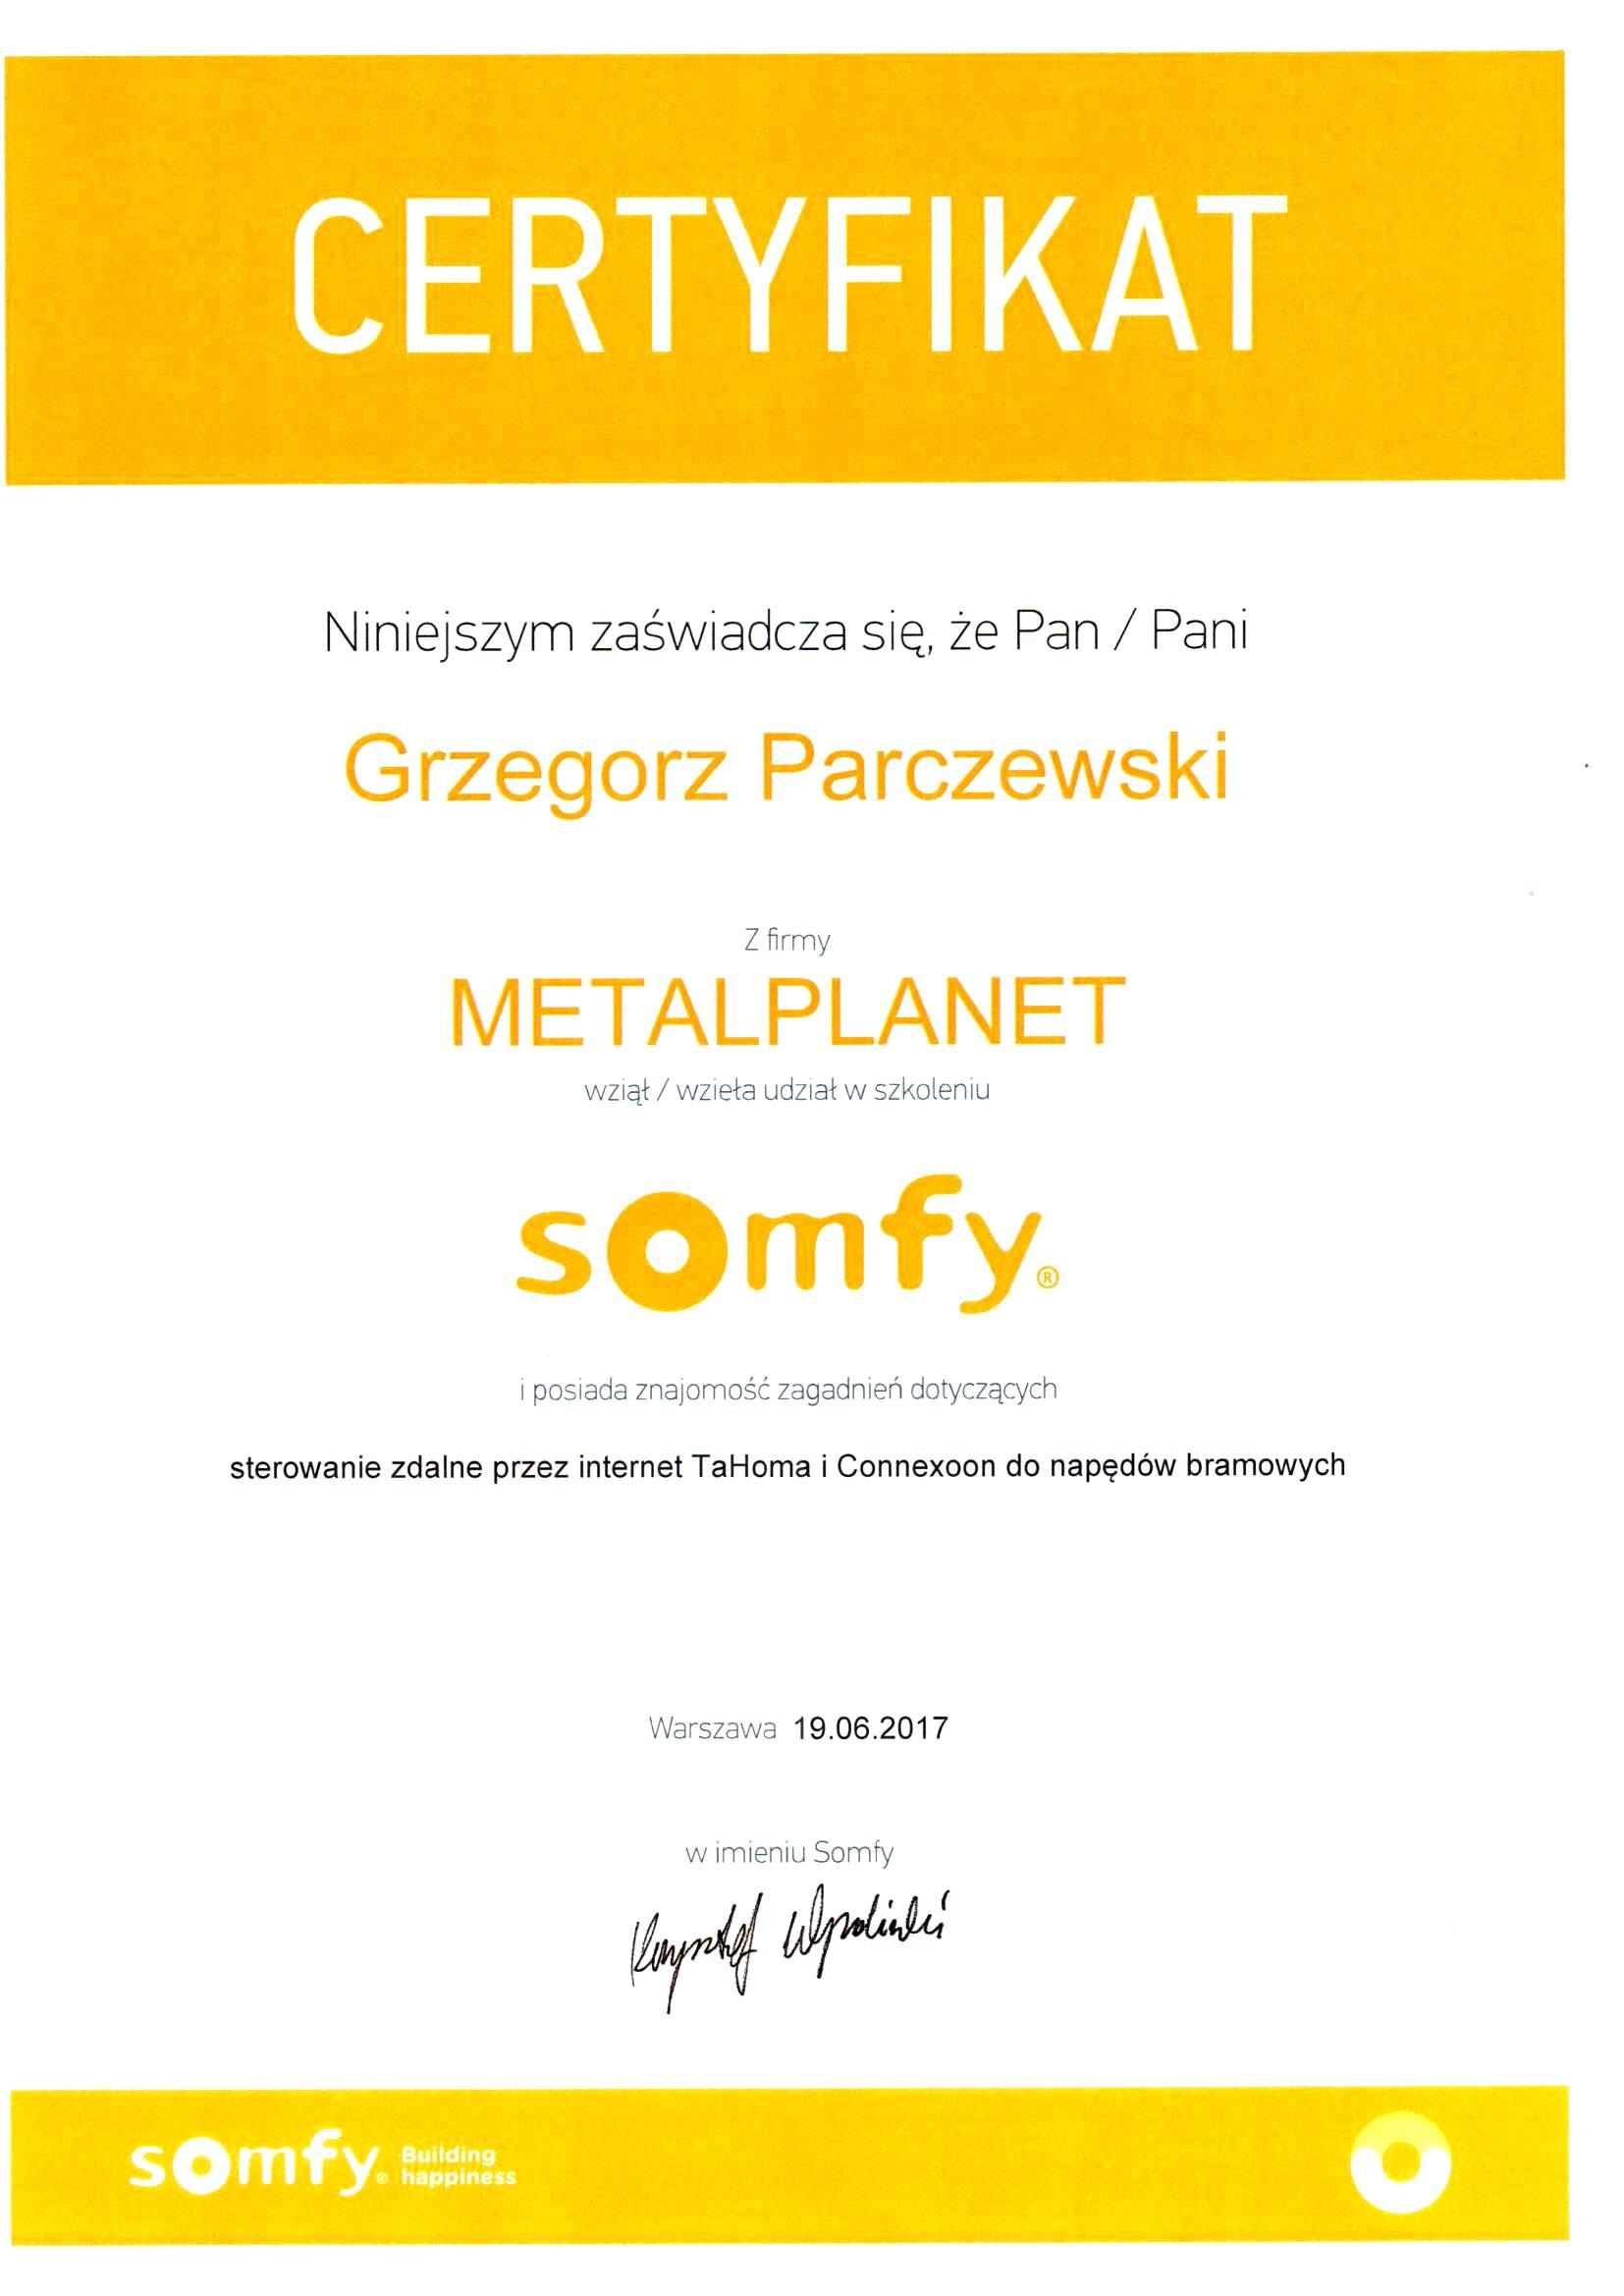 Certyfikat Somfy